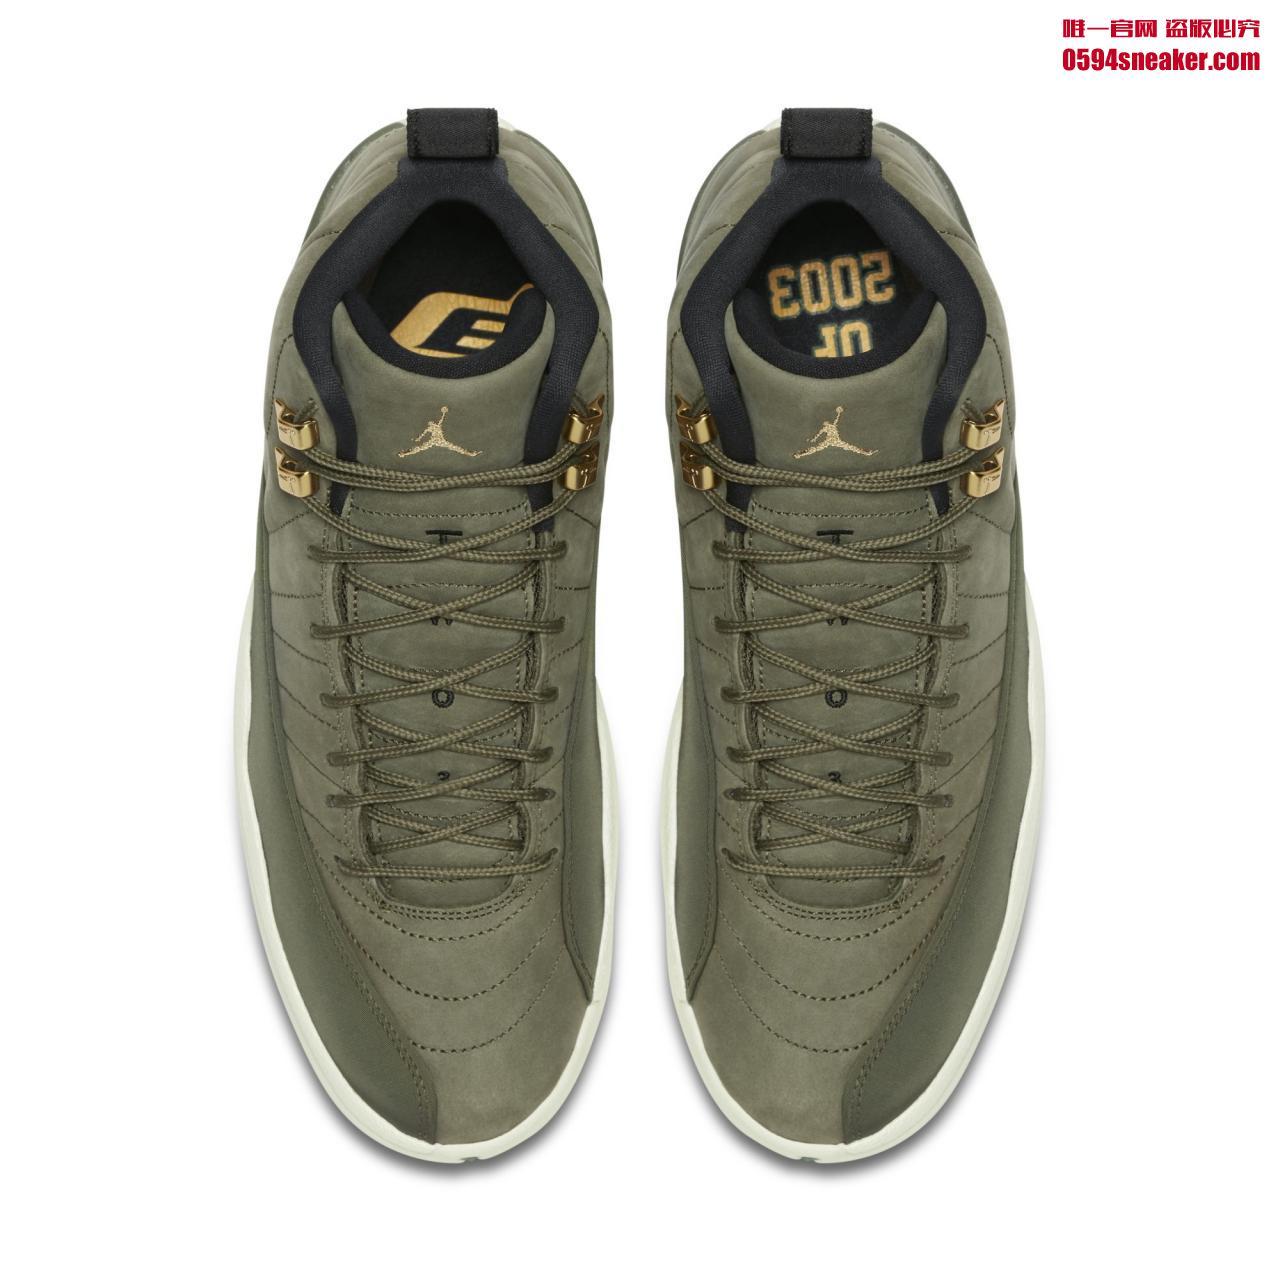 "Air Jordan 12 ""Chris Paul Class of 2003"" 货号:130690-301 | 球鞋之家0594sneaker.com"